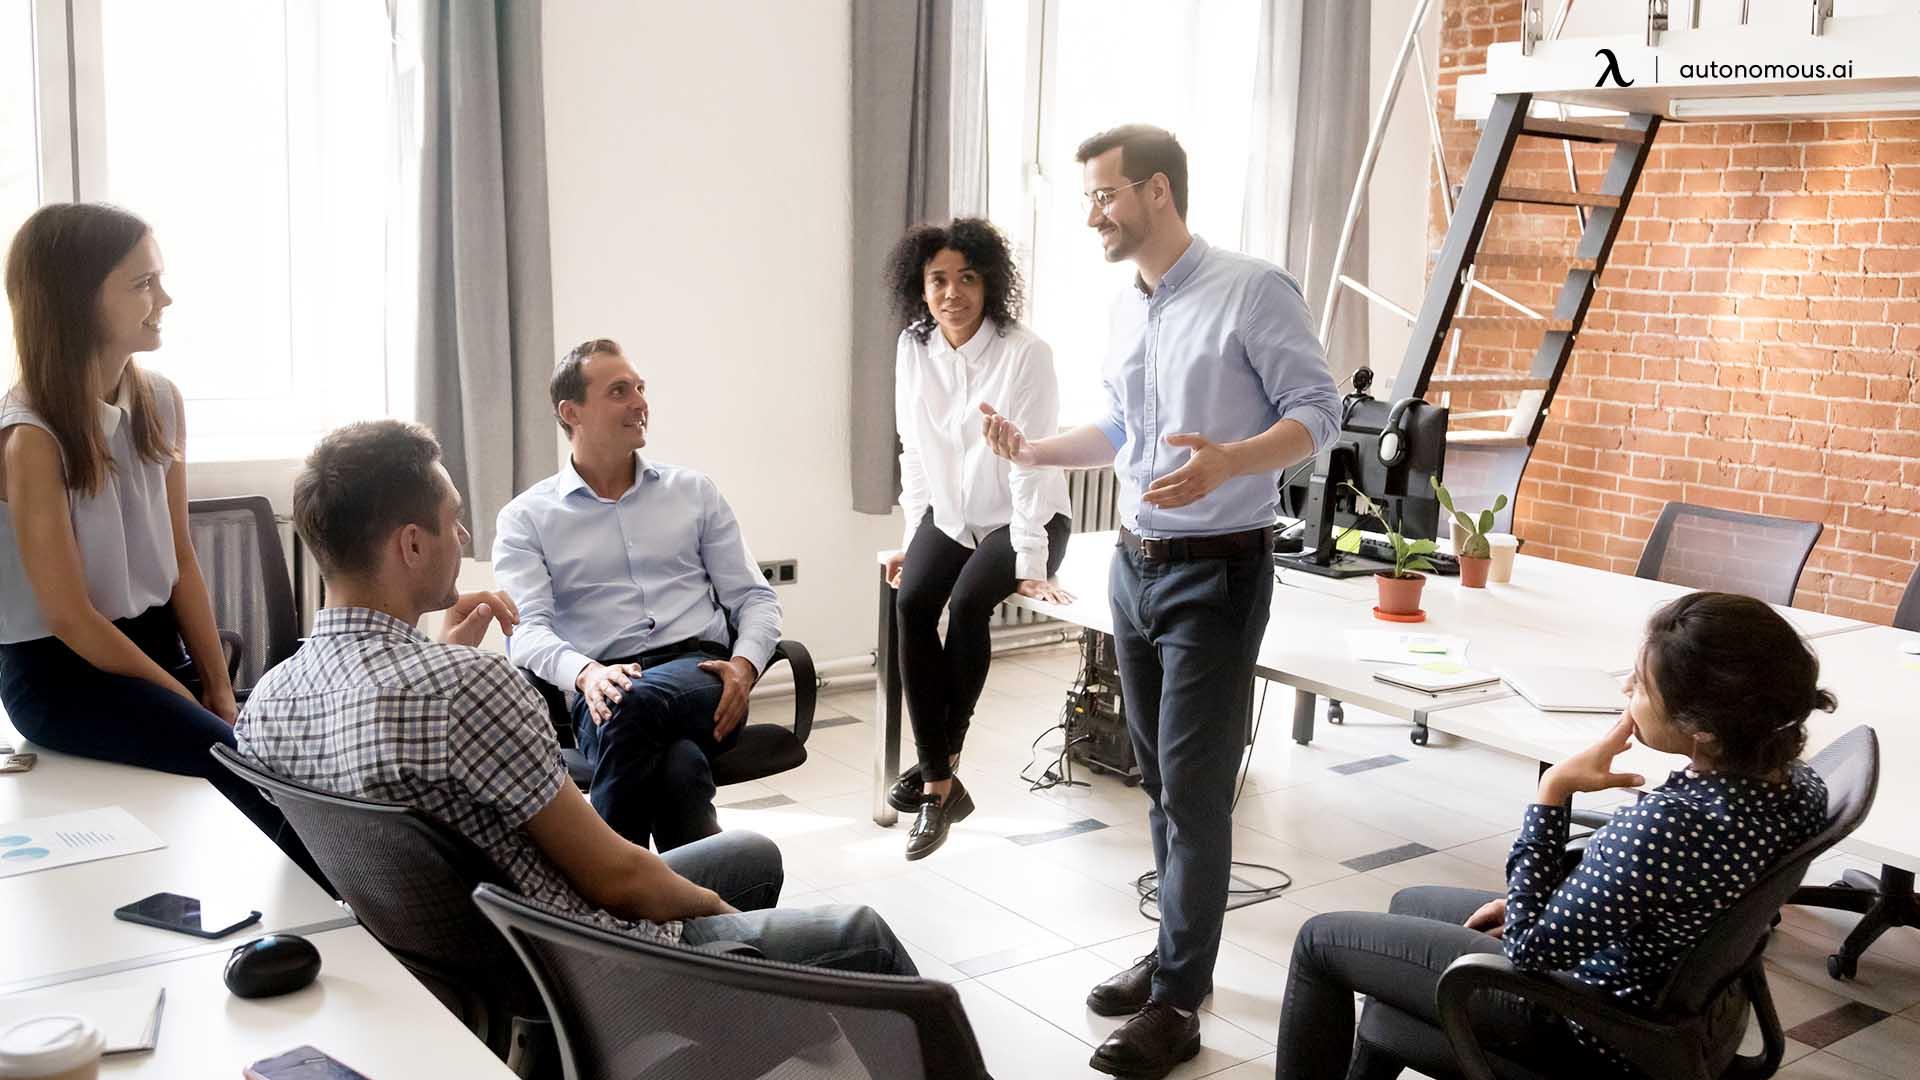 improve the workplace culture